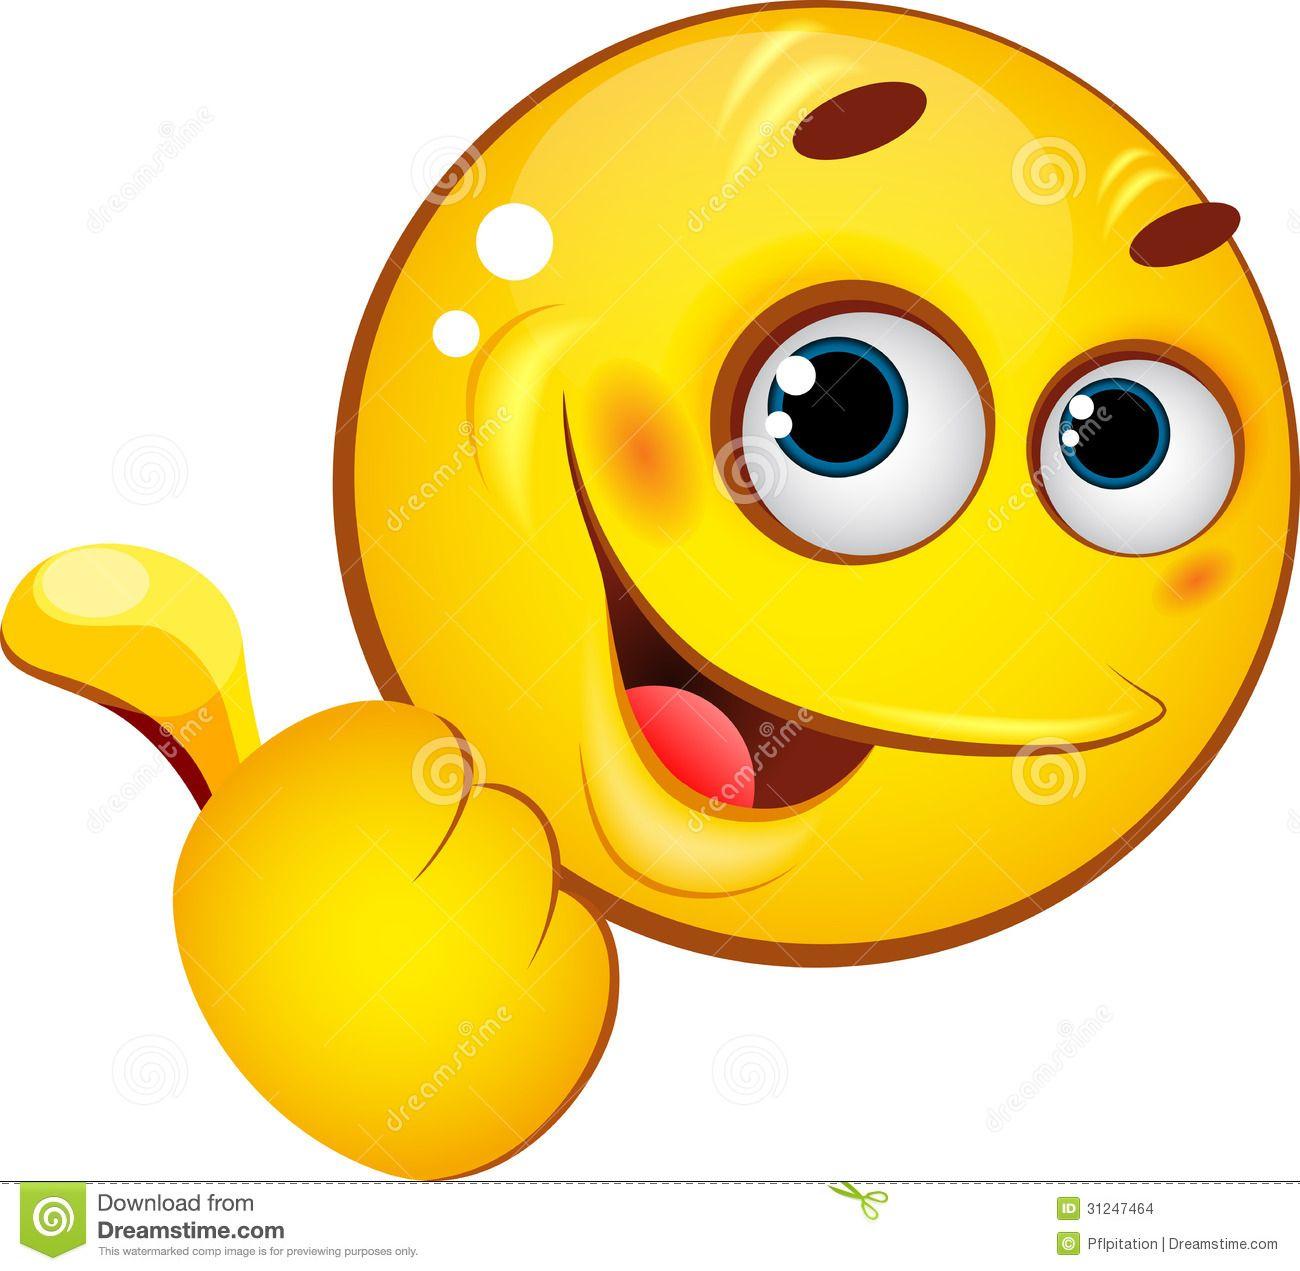 42++ Thumbs up clipart emoji ideas